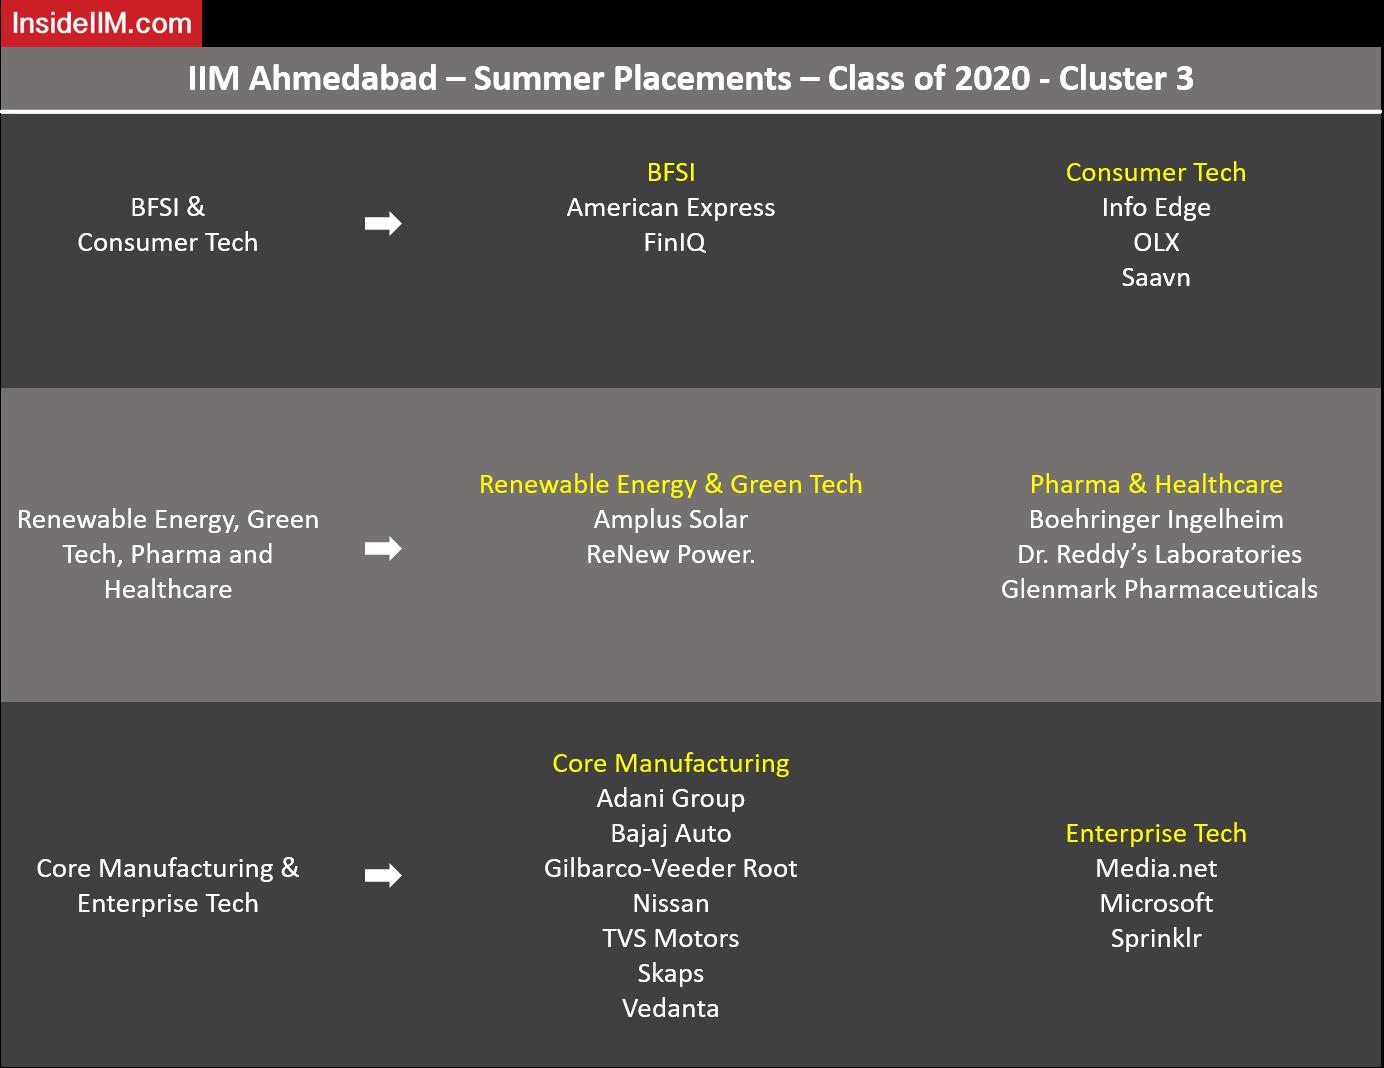 IIM Ahmedabad Placements - Companies: BFSI & Consumer Tech, Renewable Energy, Green Tech, Pharma, Healthcare, Core Manufacturing & Enterprise Tech